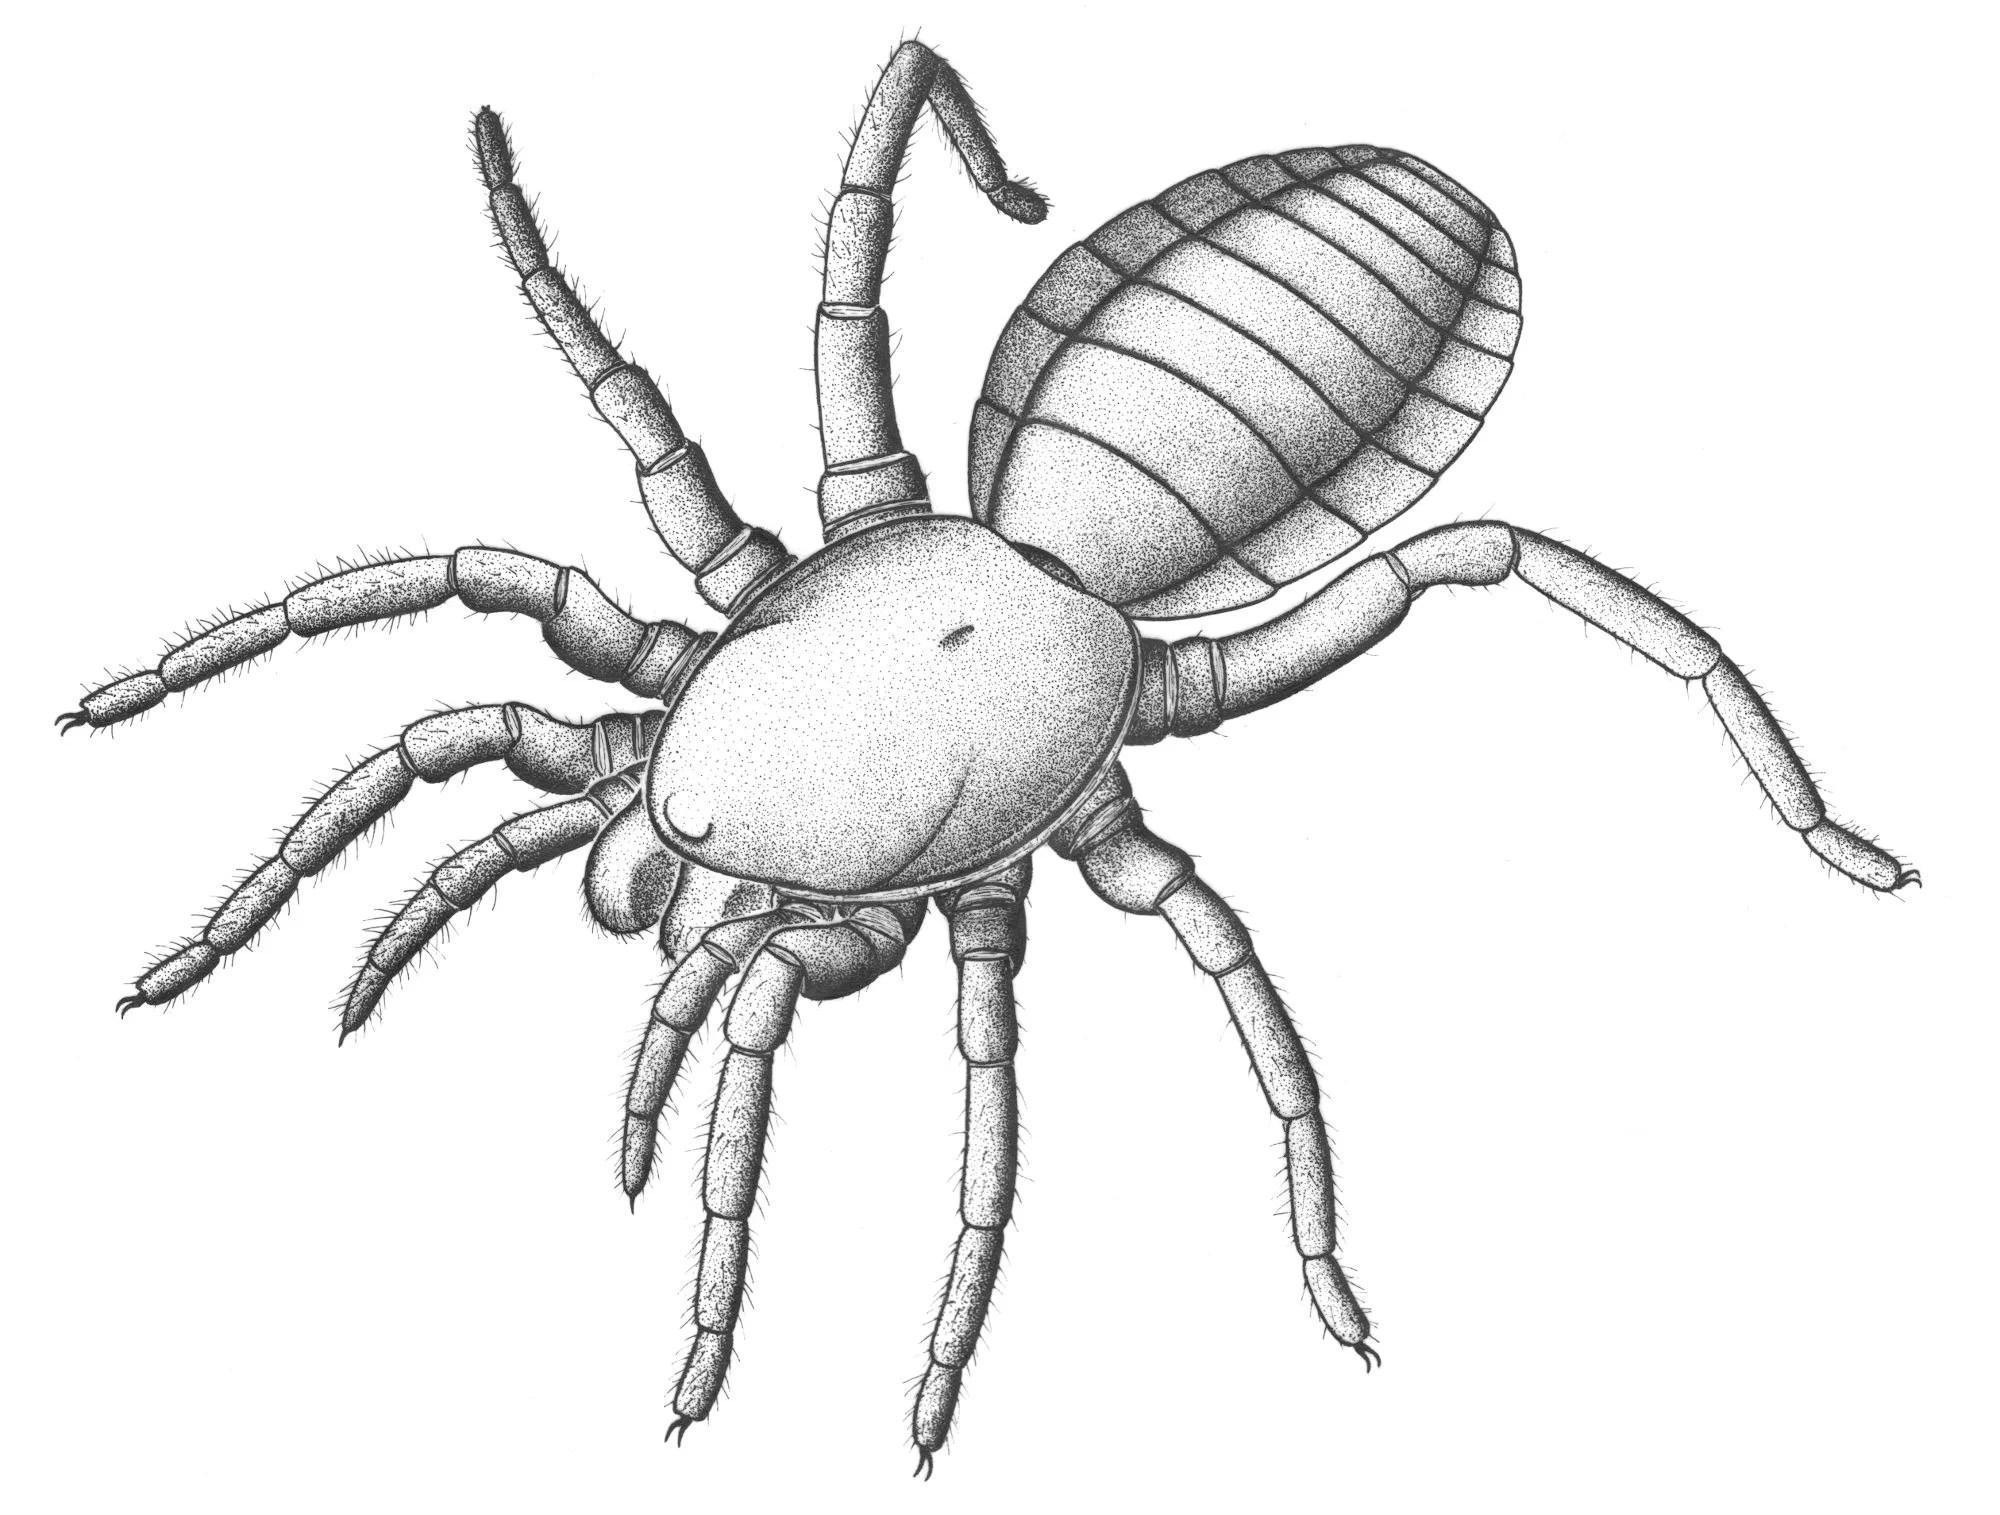 305 Million Year Old Almost Spider Unlocks Arachnid